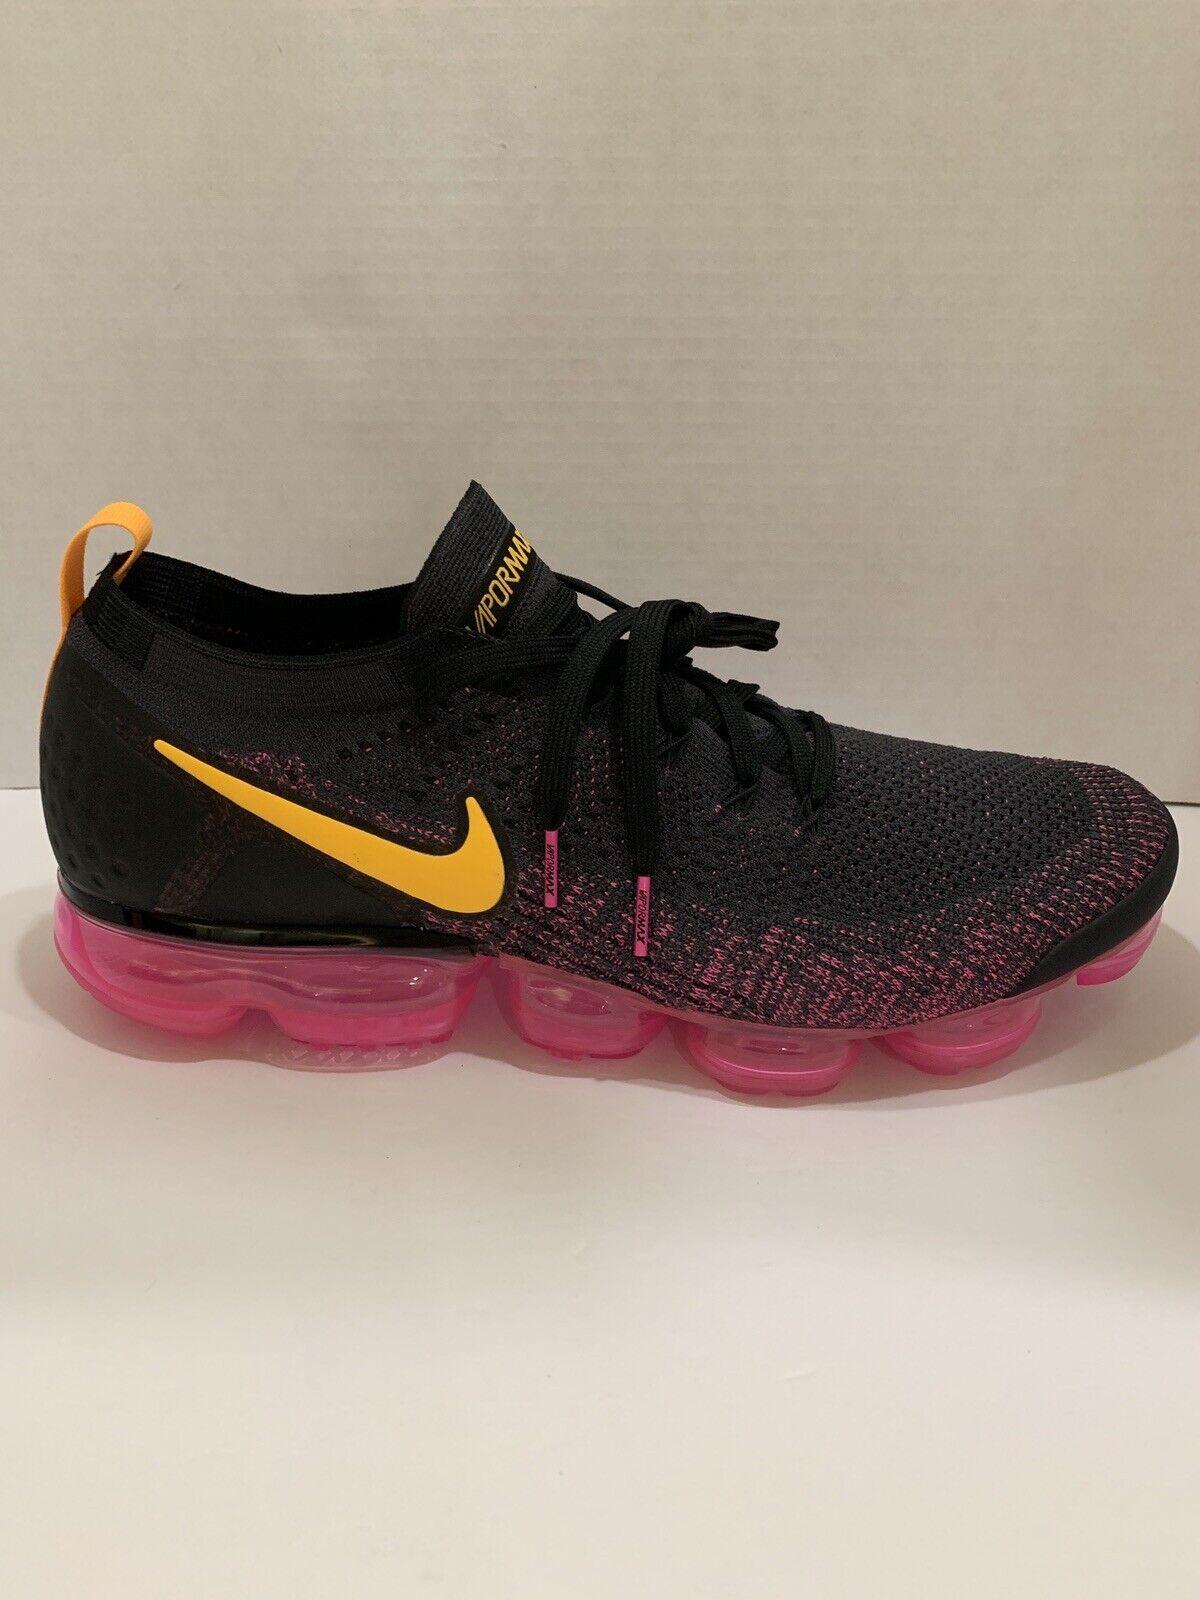 297e5b24935 Nike Air Vapormax Flyknit 2 II Pink Blast orange Men Running shoes  942842-008